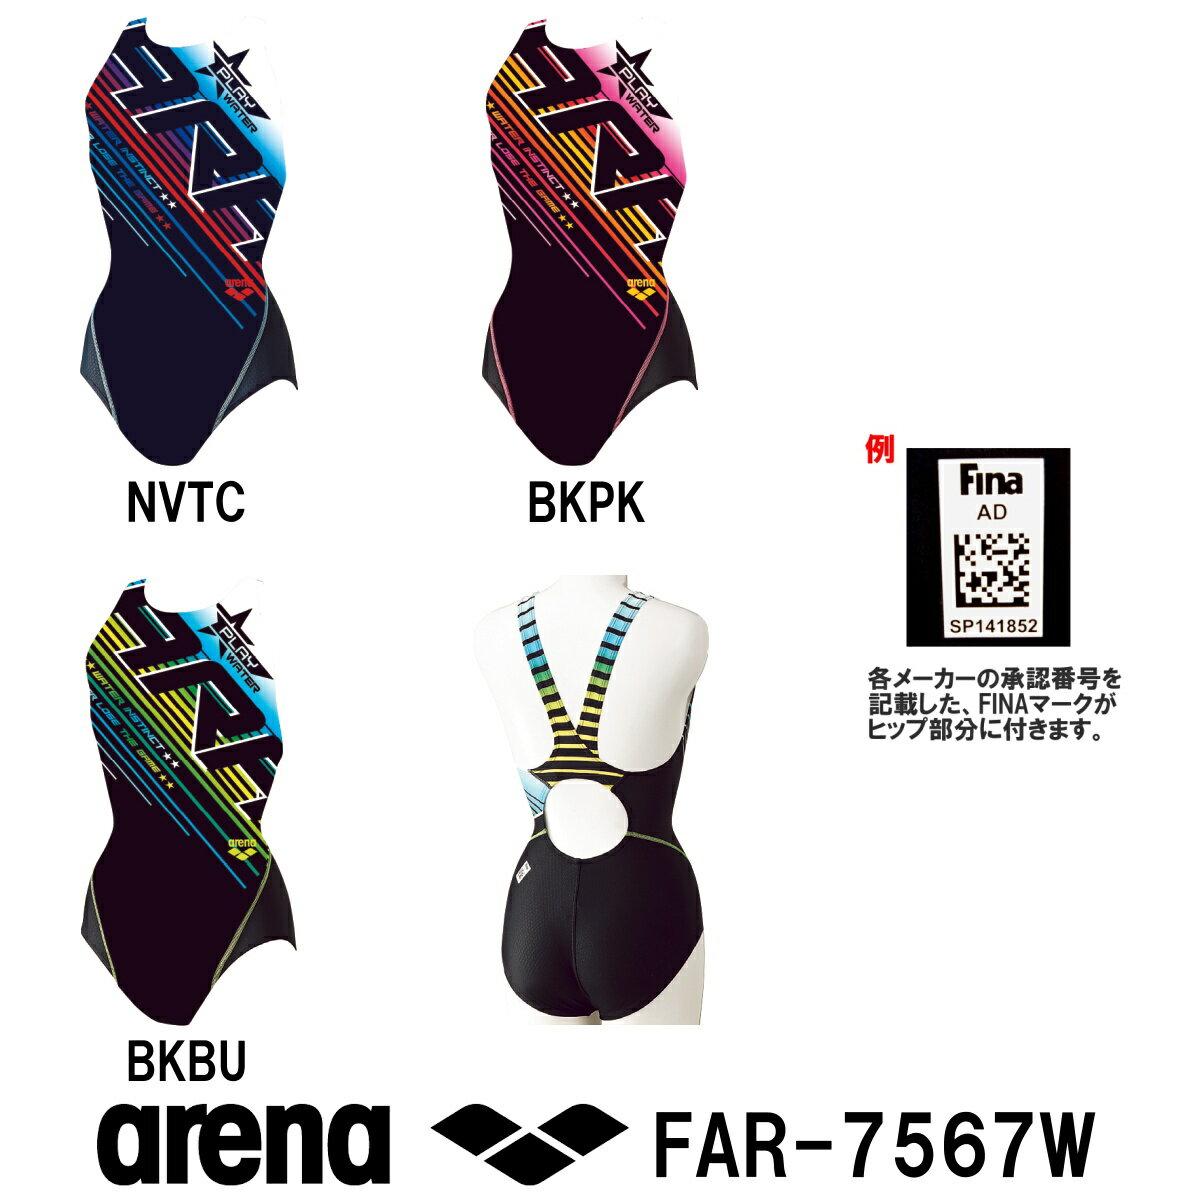 【FAR-7567W】ARENA(アリーナ) レディース競泳水着  UROKO SKIN セーフリーバック(着やストラップ)[競泳水着/女性用/ワンピース/FINA承認]